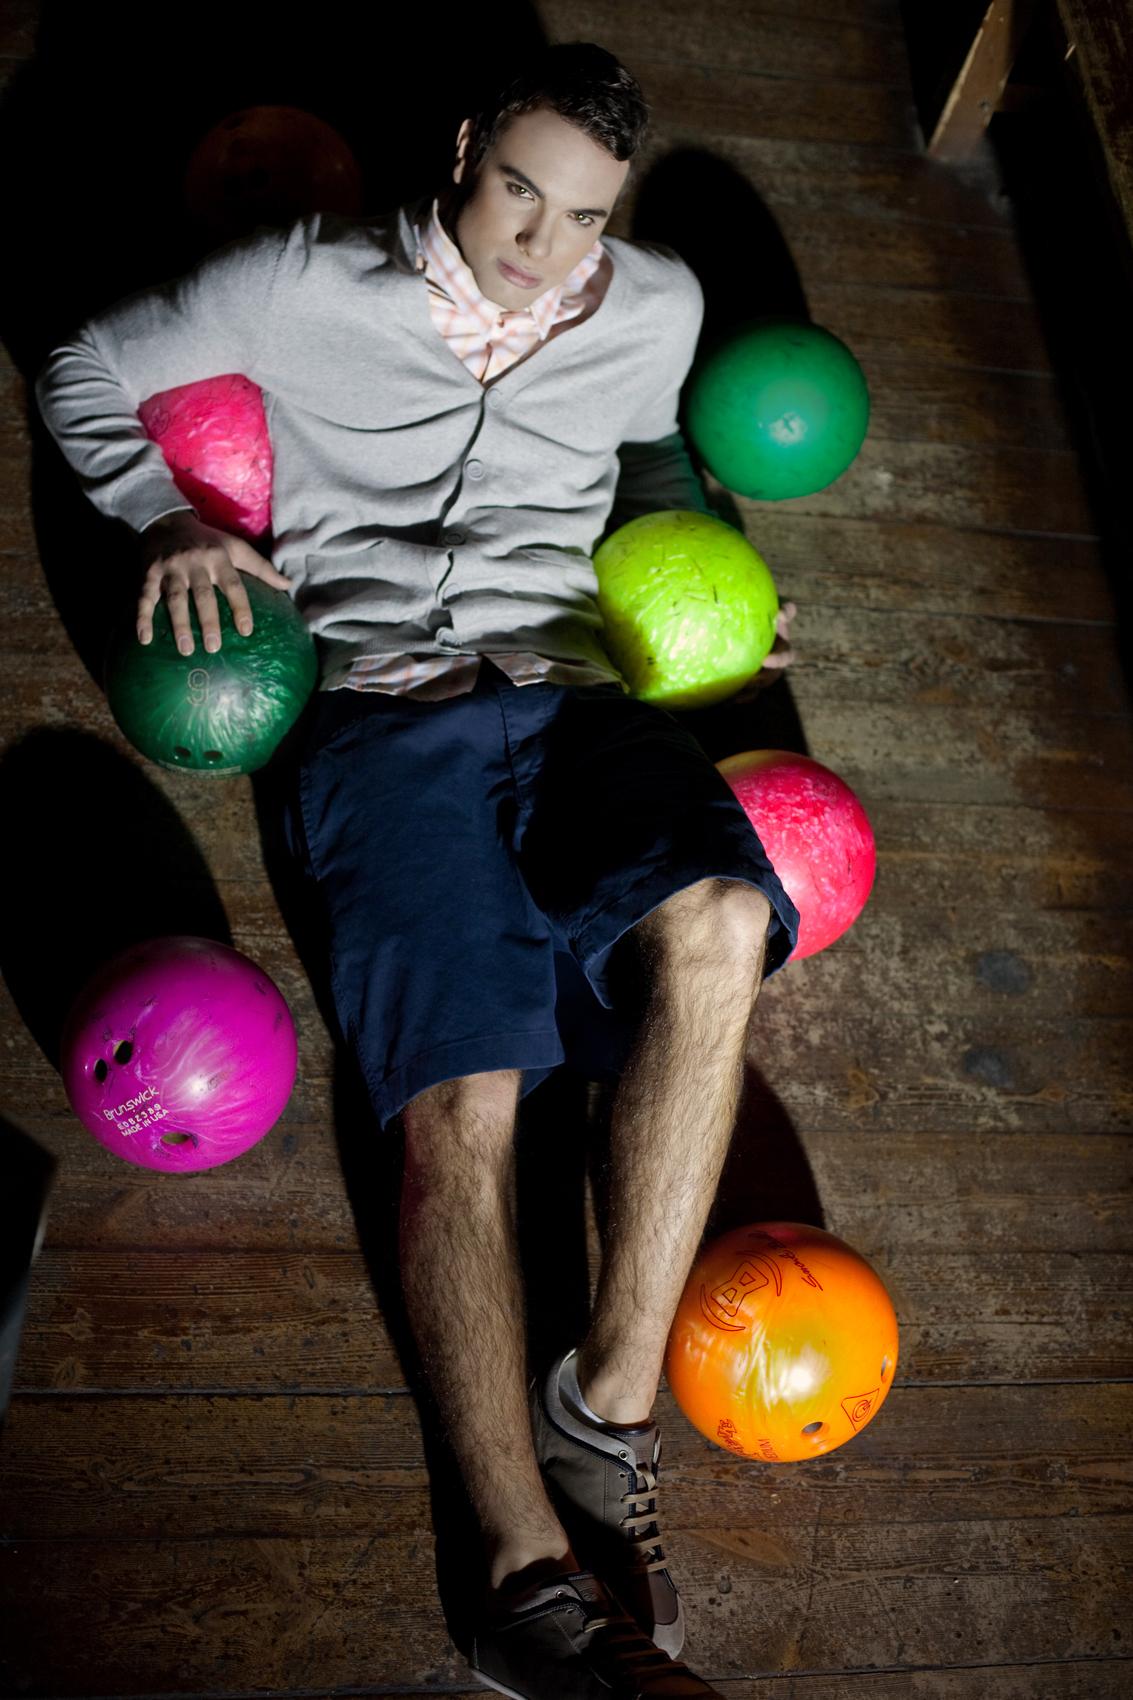 Bowling photoshoots for LA'ISHA magazin